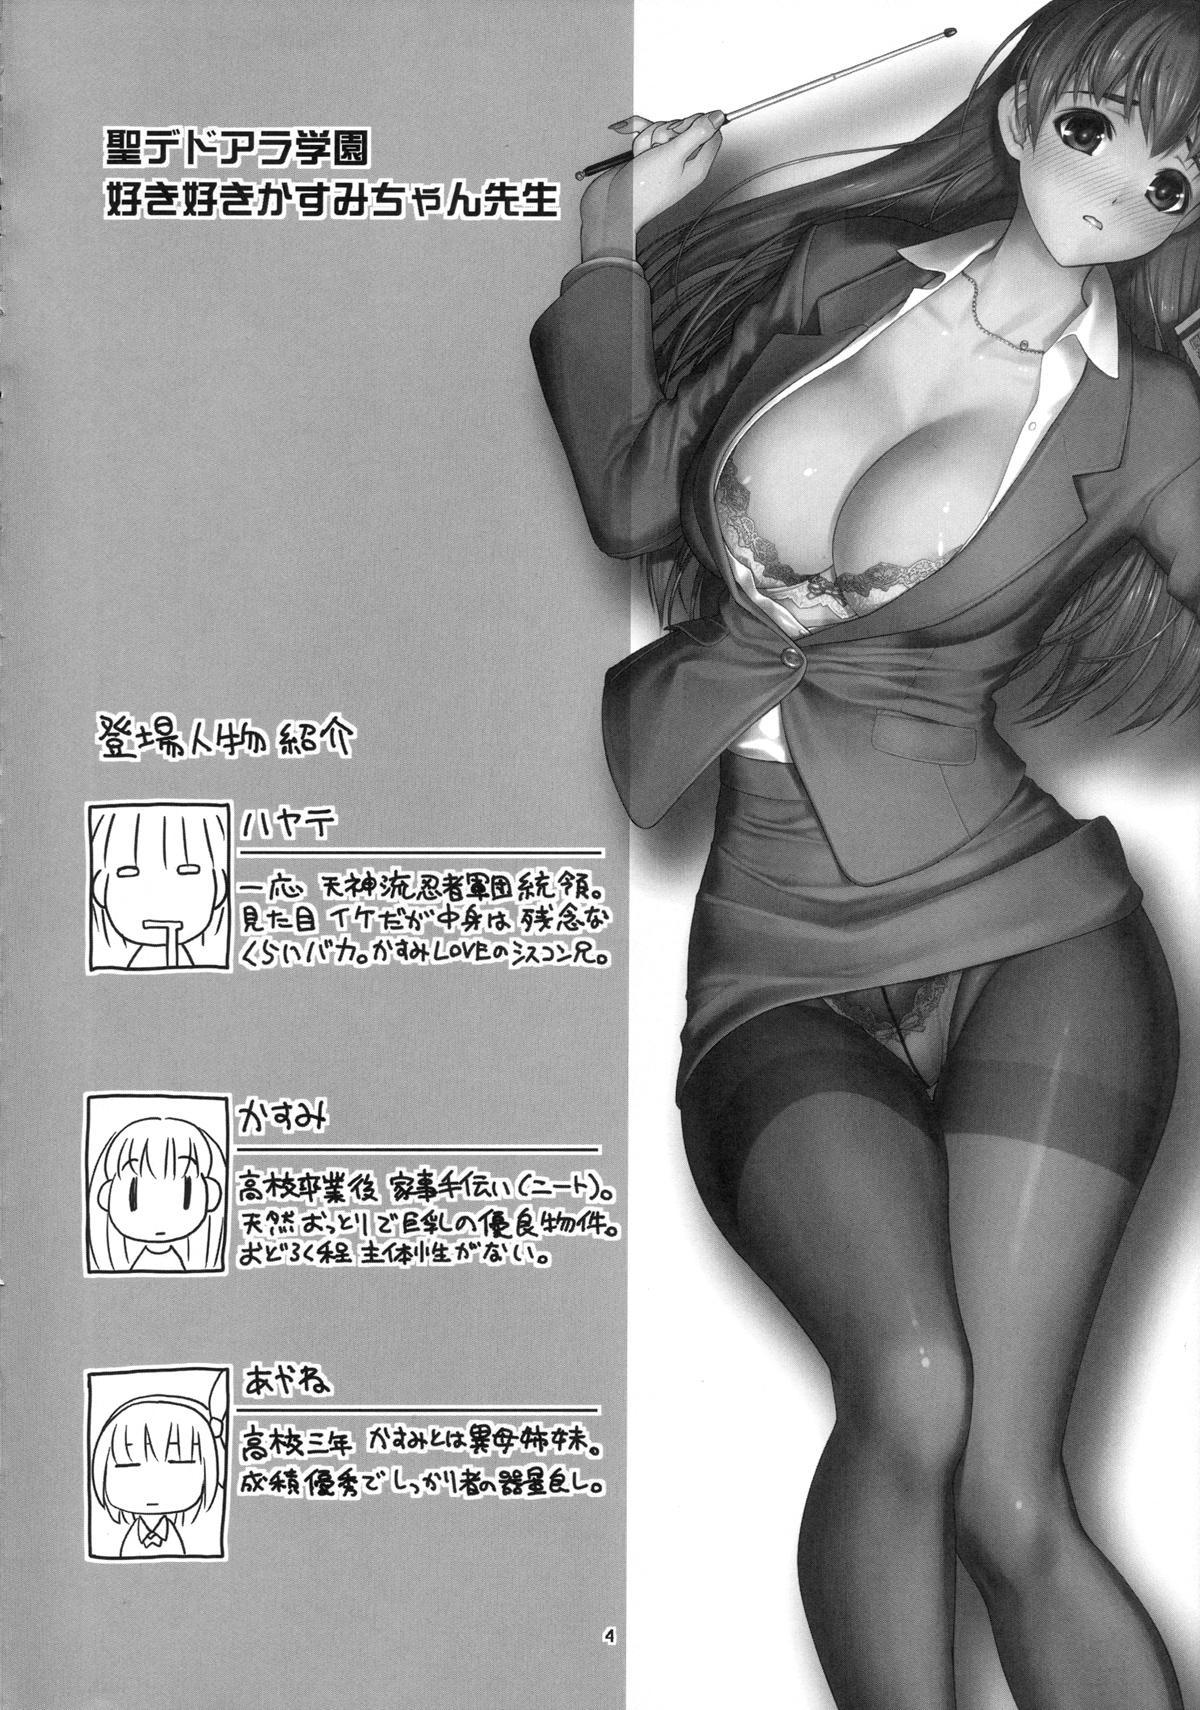 St. Dead or Alive Highschool - Love Love Kasumi Chan Teacher 2